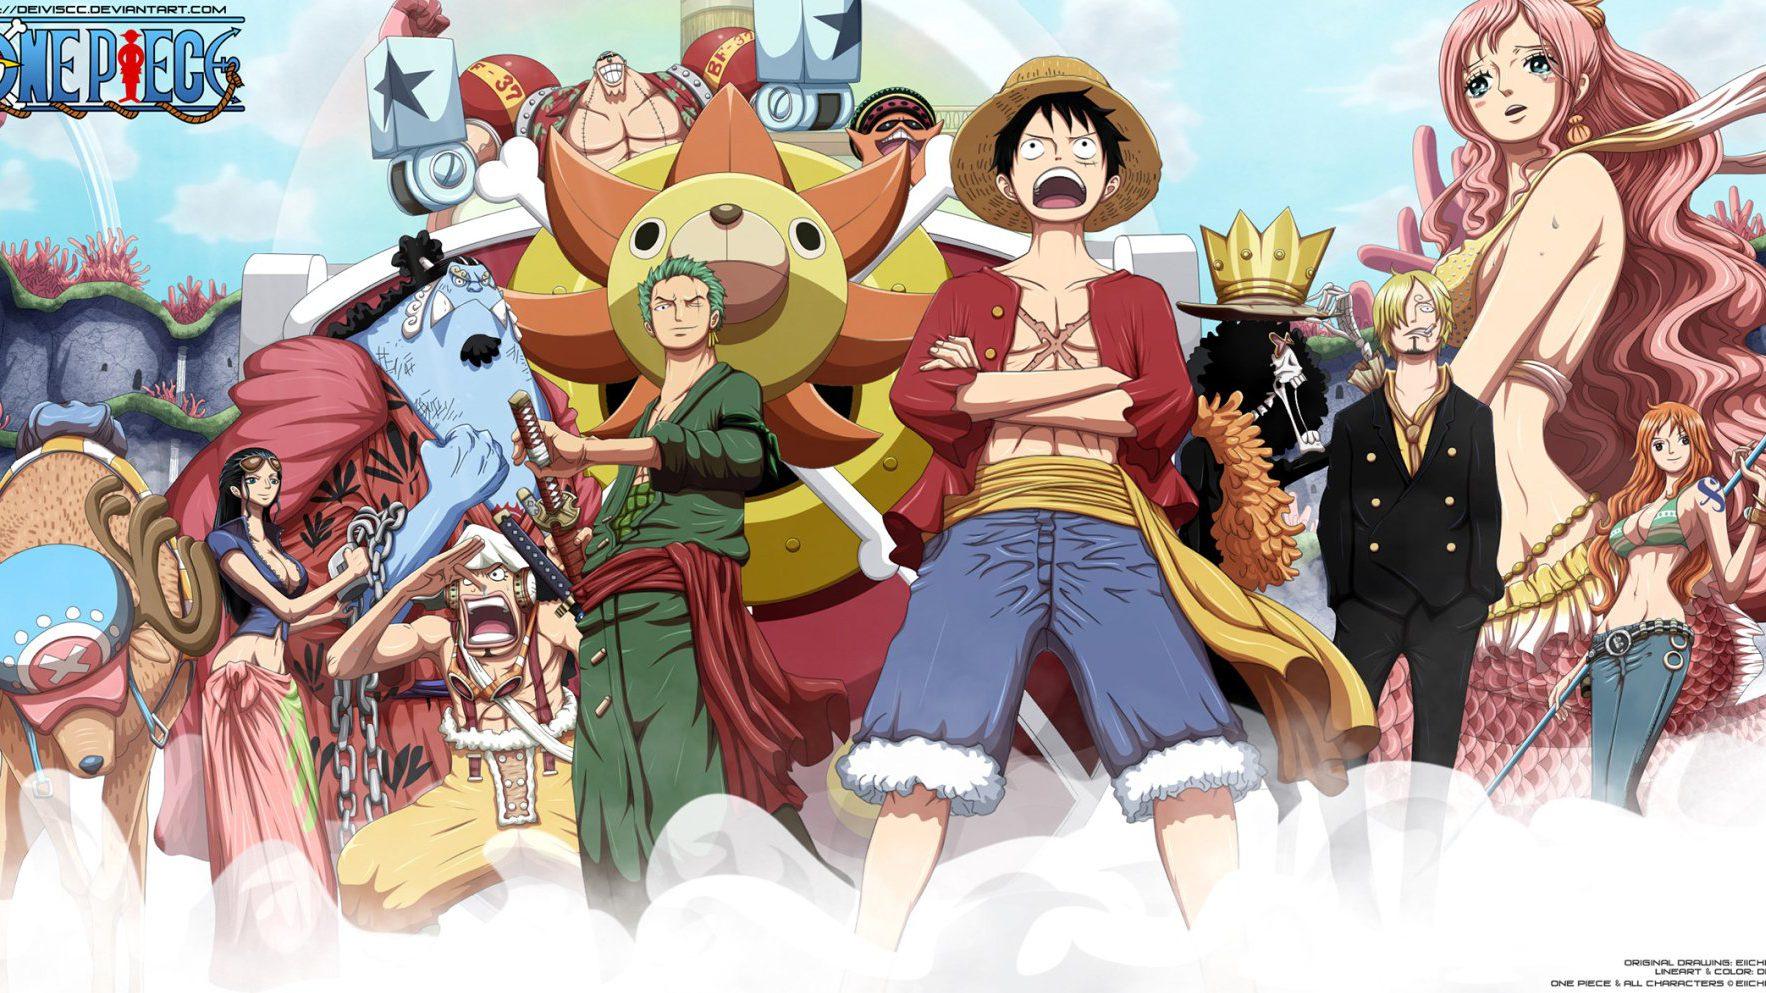 One Piece 1001 Spoiler: Luffy vs Kaido, trận chiến lịch sử chính thức bắt đầu